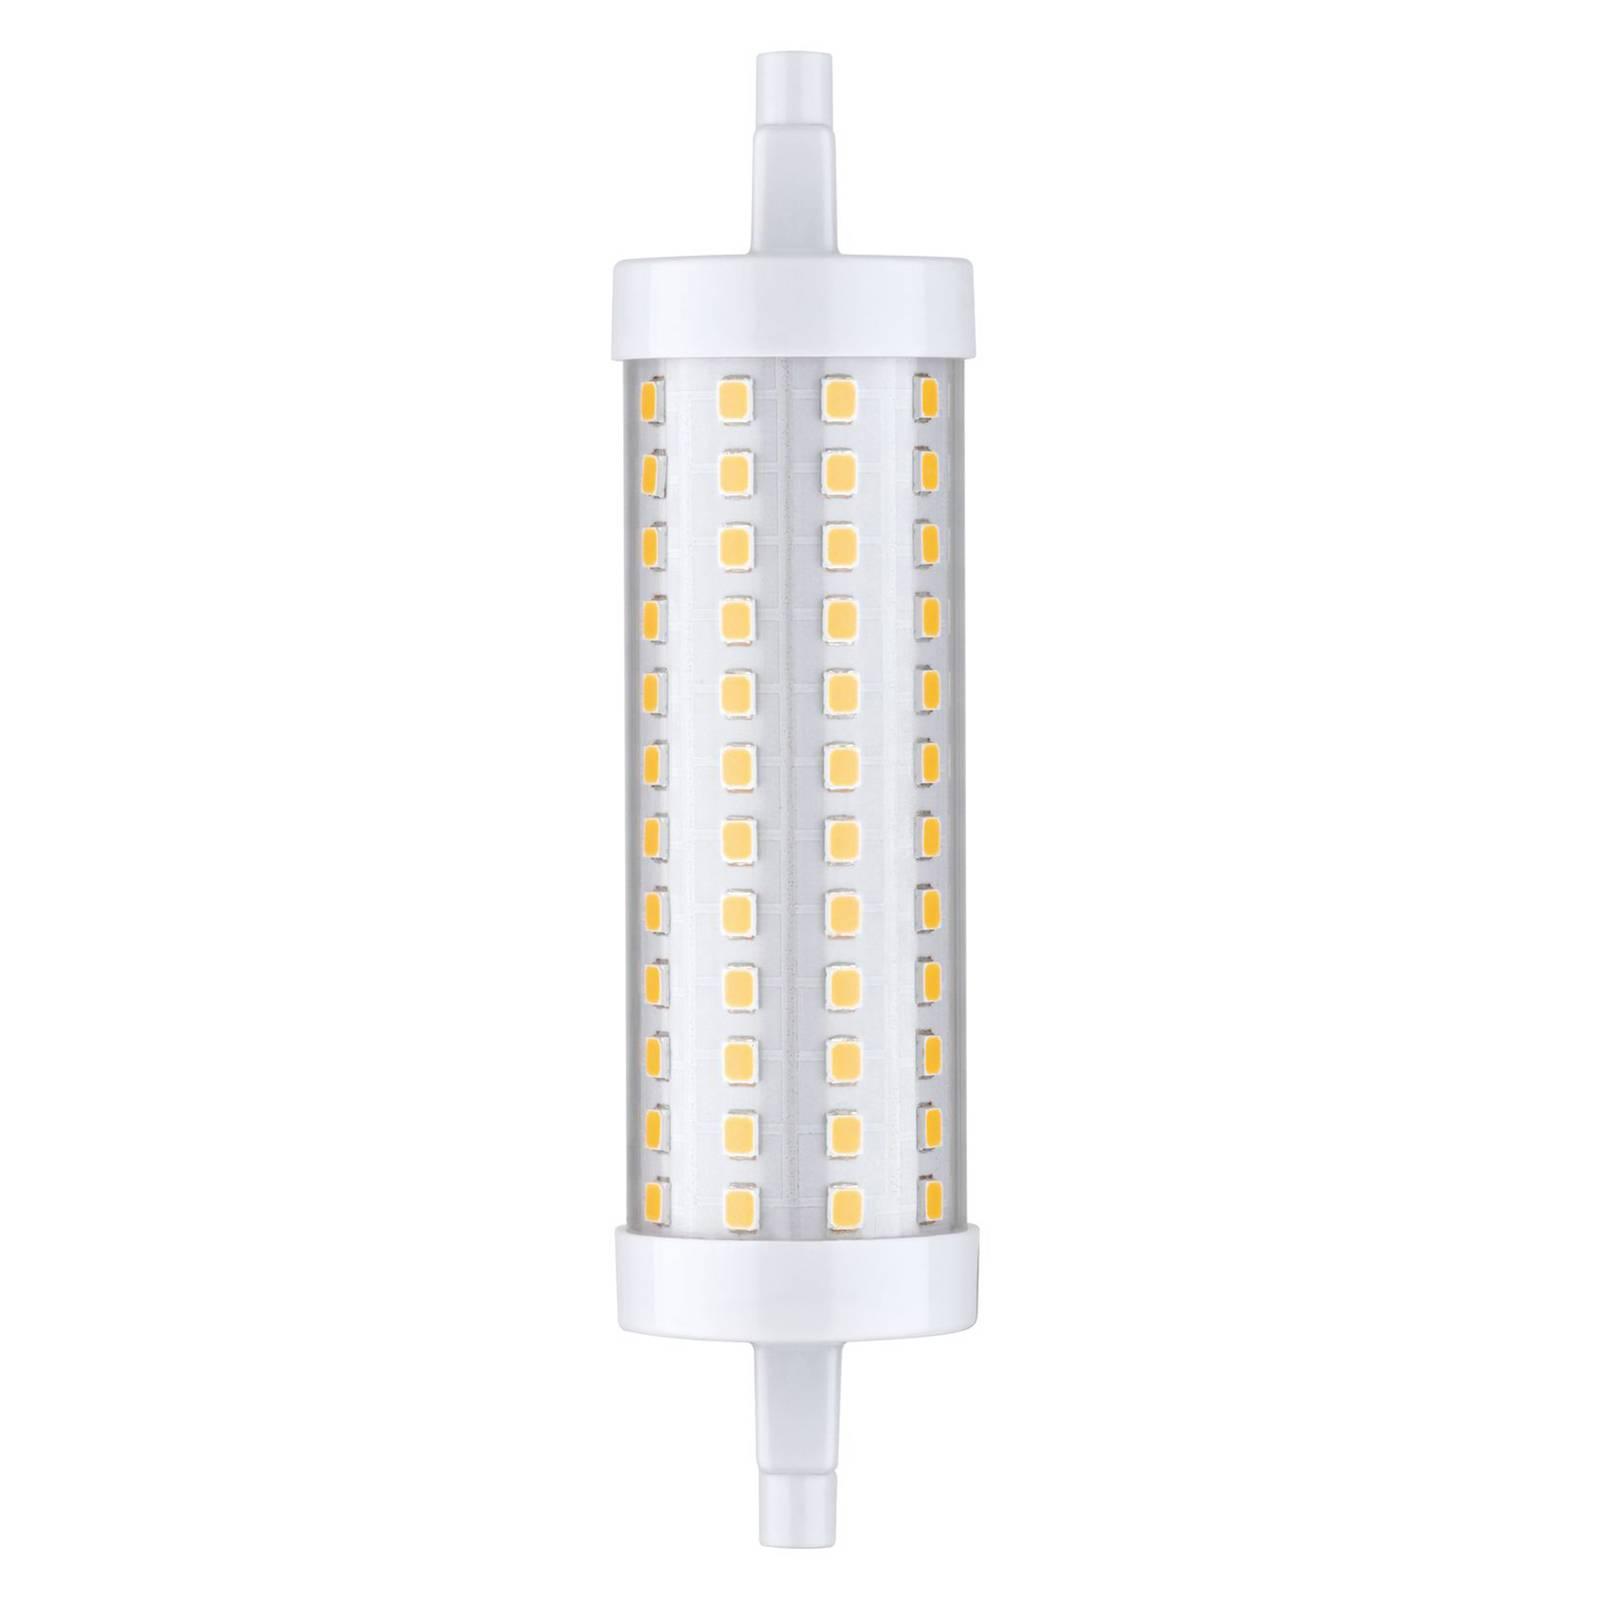 Paulmann LED-lampa R7s 118 mm, 13W 1 521 lm dimbar